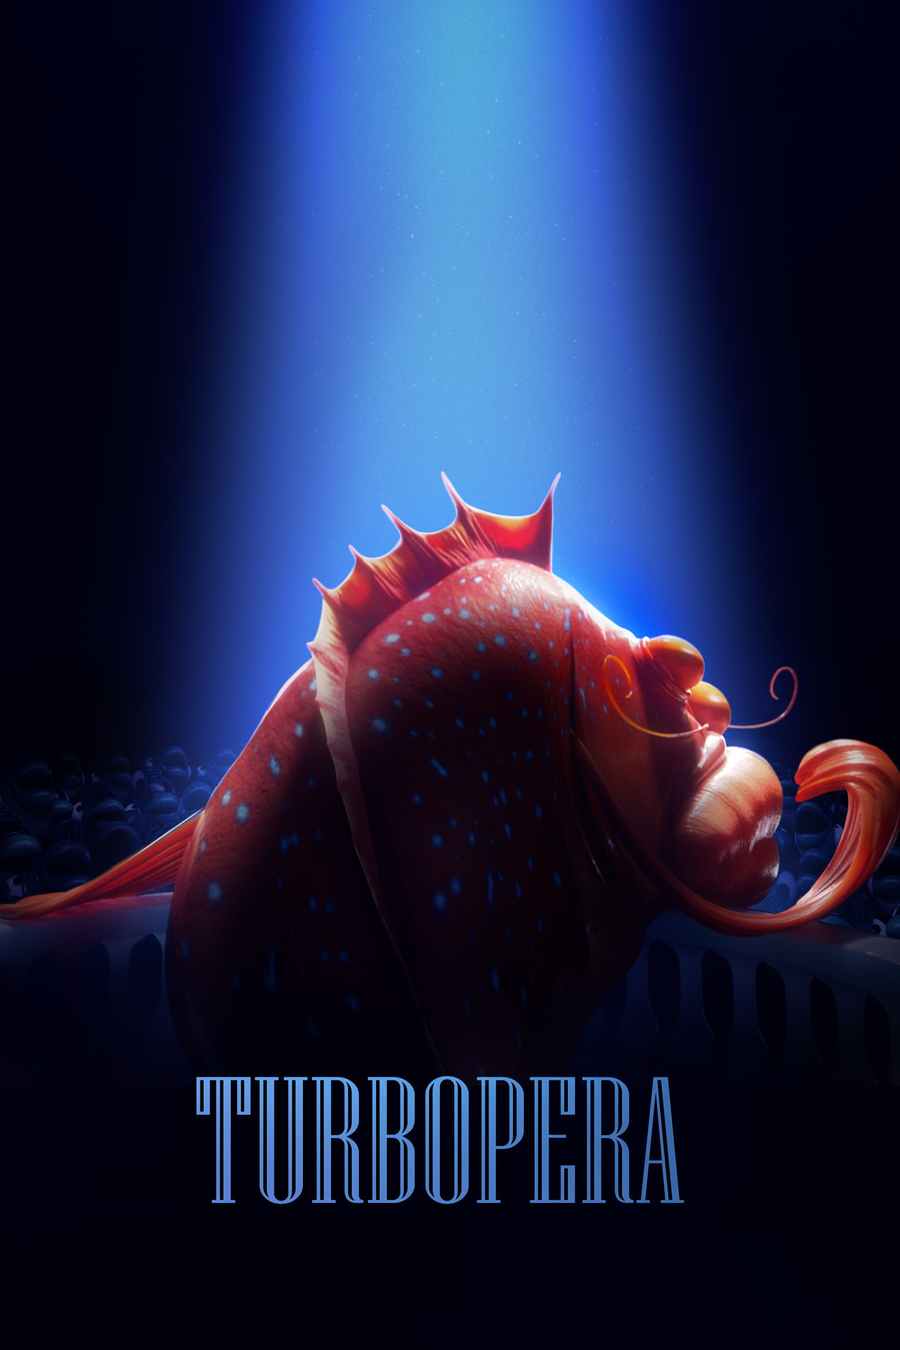 Turbopera